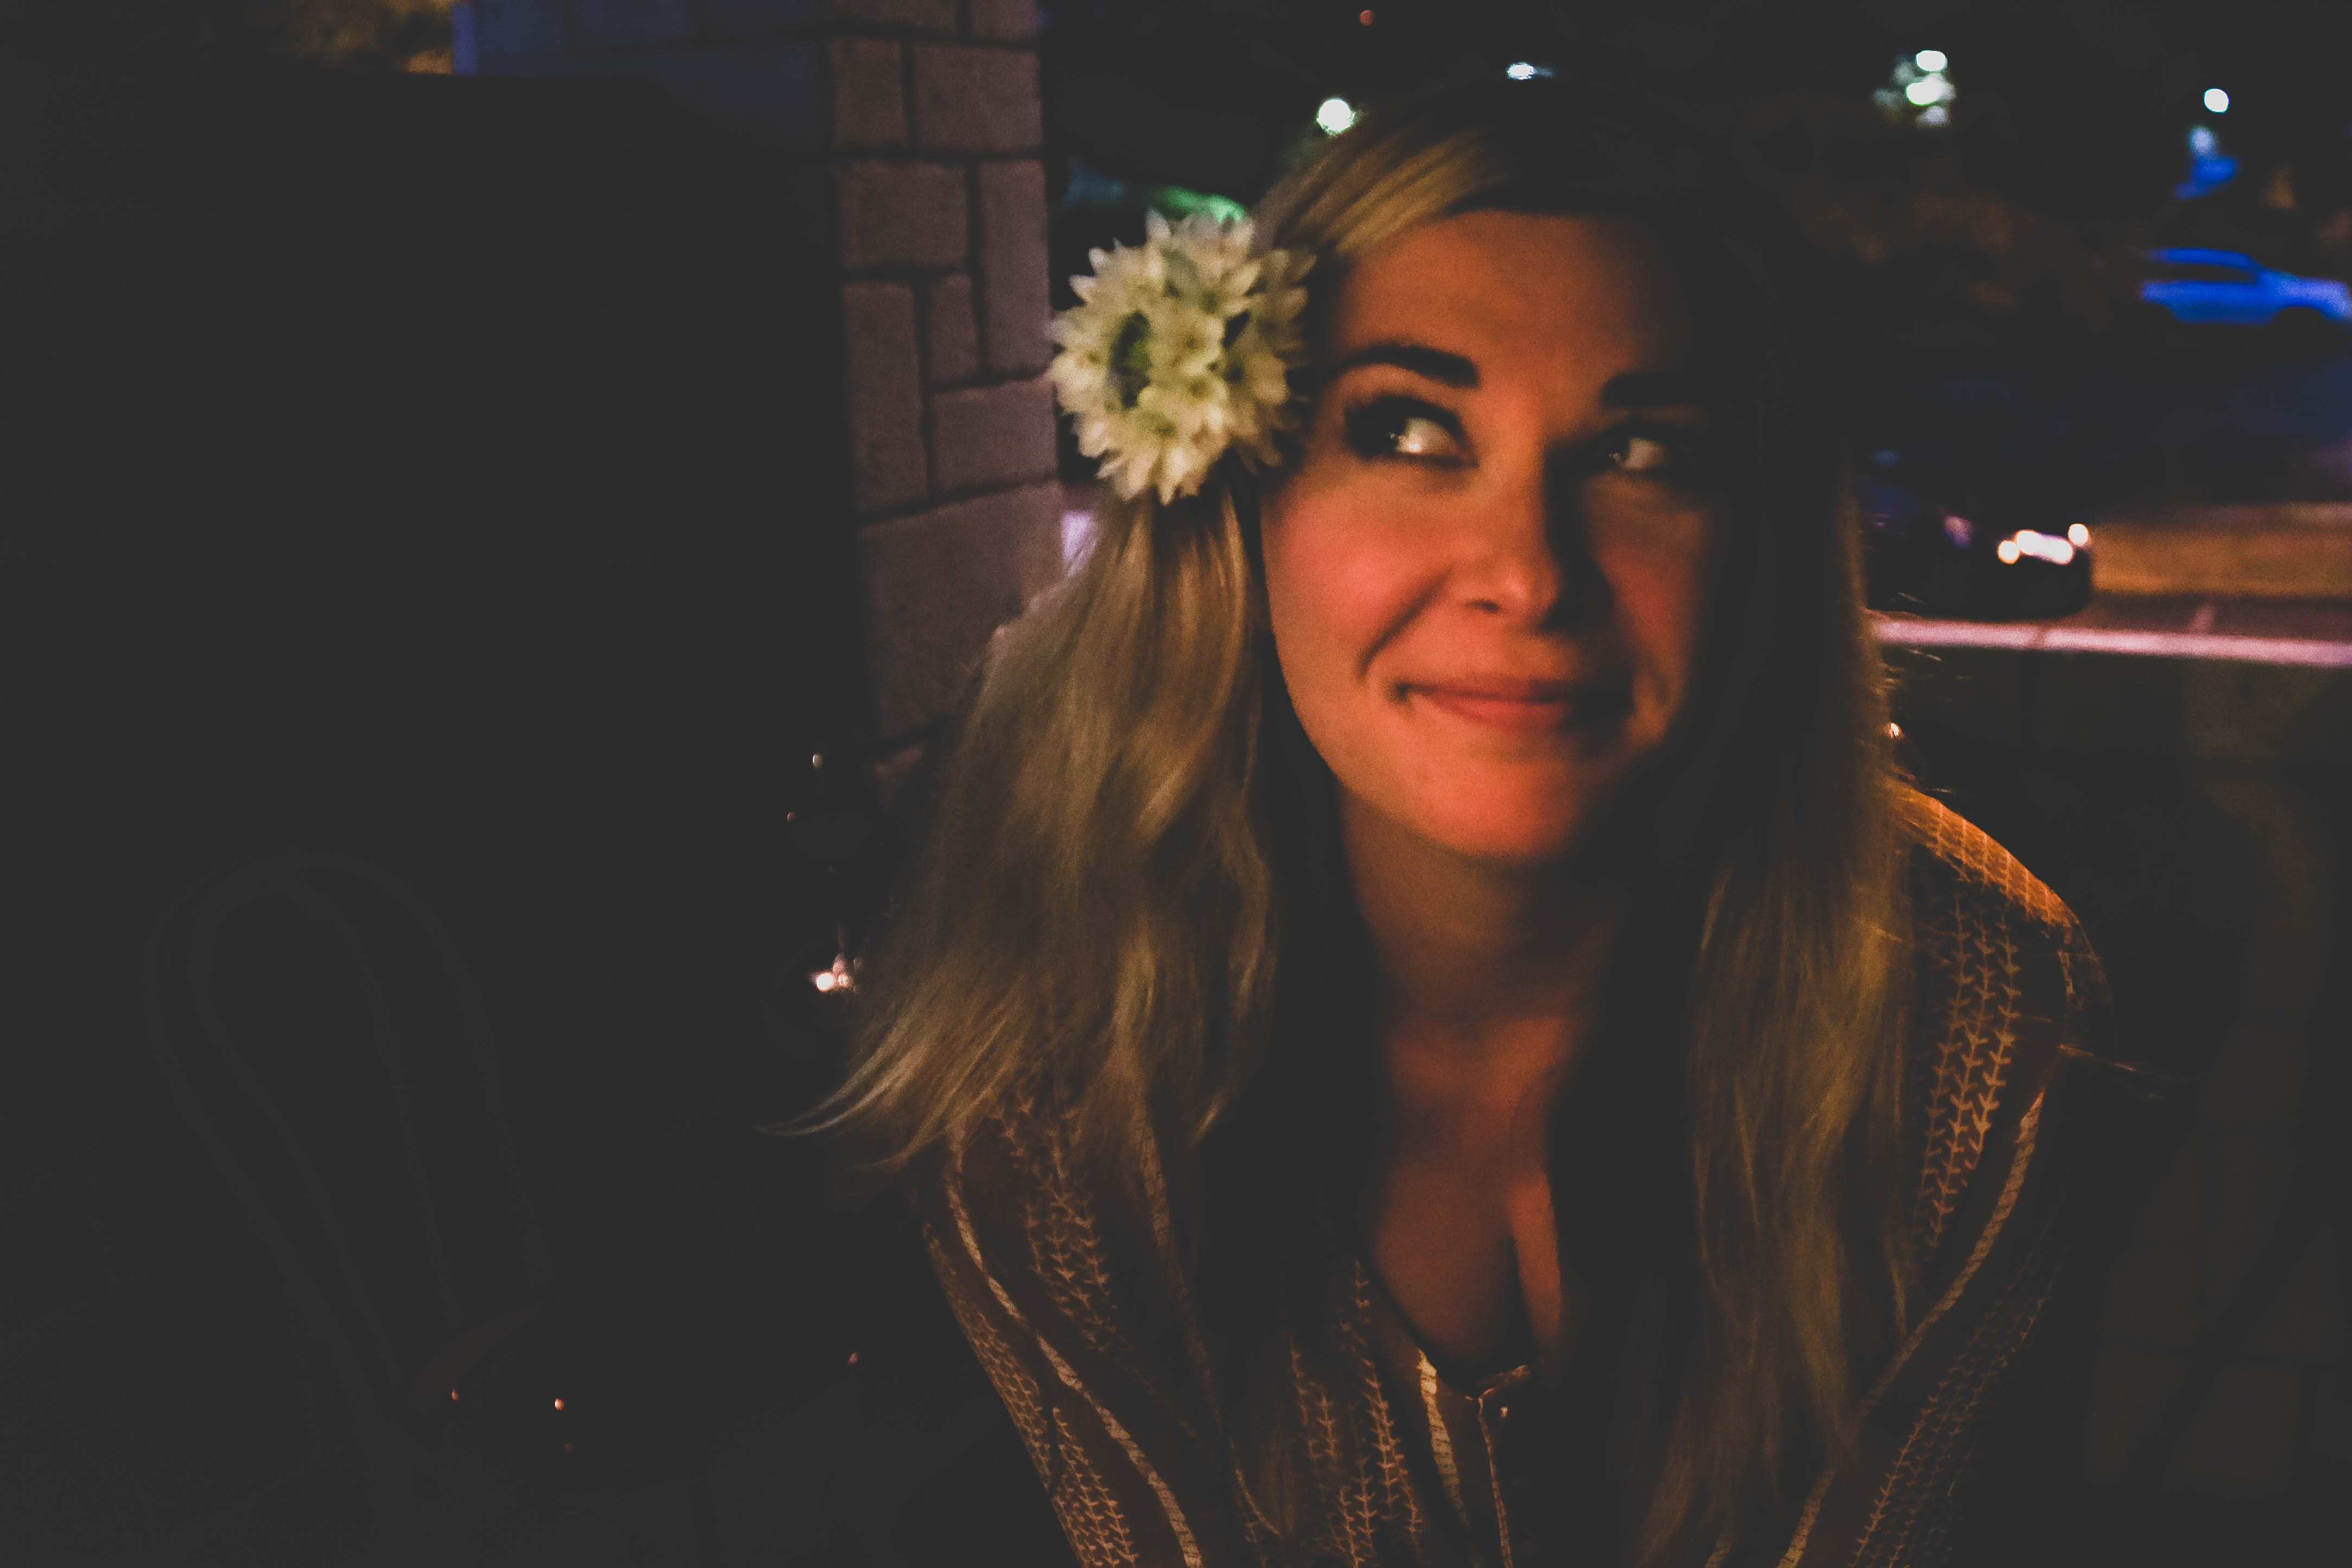 Free stock photo of girl, portrait, fun, hippie